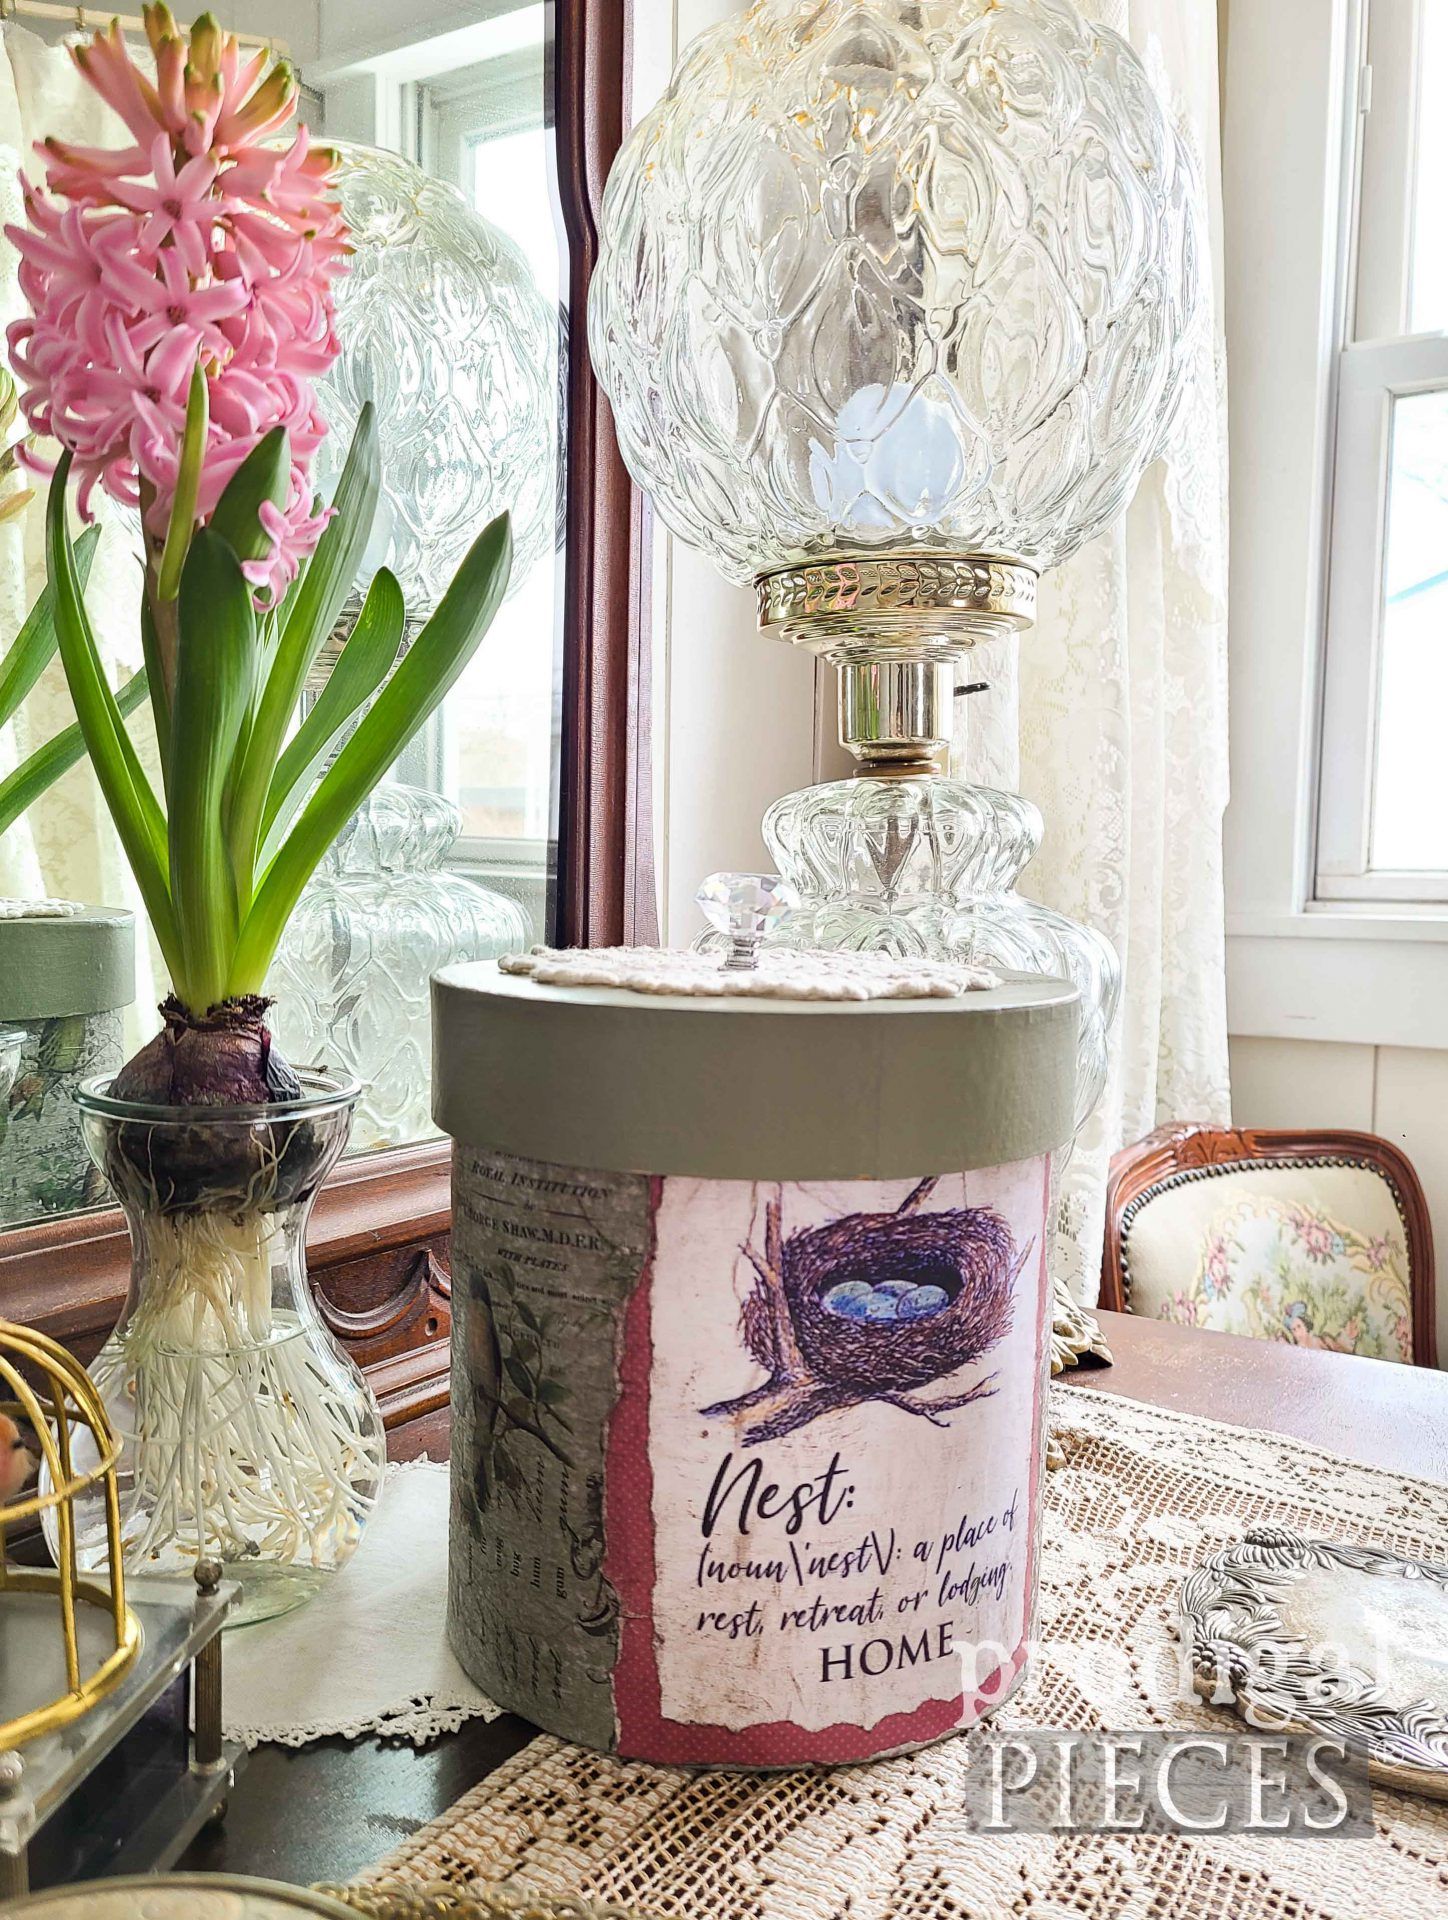 Vintage Style Decoupaged Storage Box by Larissa of Prodigal Pieces | prodigalpieces.com #prodigalpieces #diy #birds #vintage